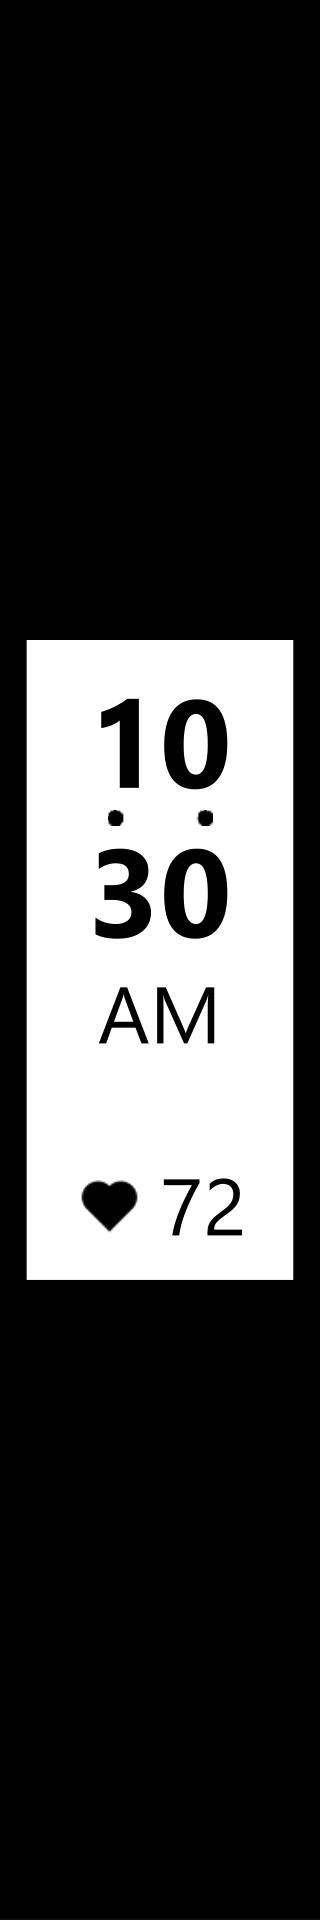 10 30 AM     72